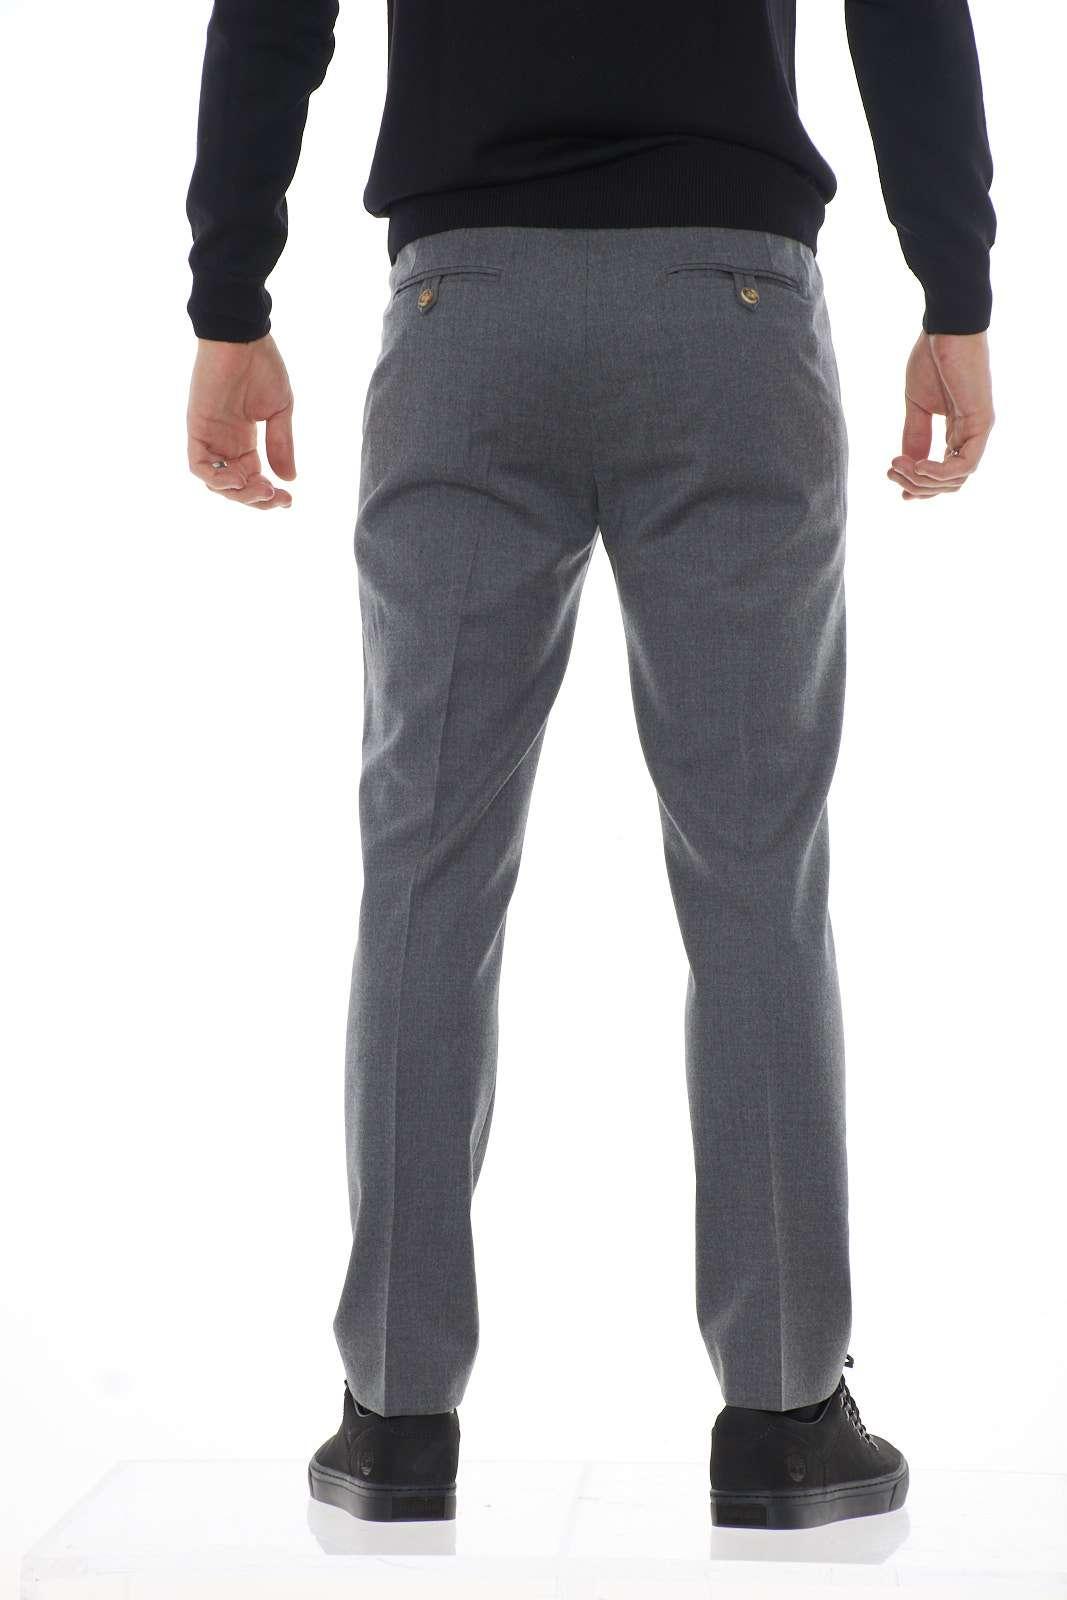 https://www.parmax.com/media/catalog/product/a/i/ai-outlet_parmax-pantaloni-uomo-entre-amis-a198355520-c.jpg